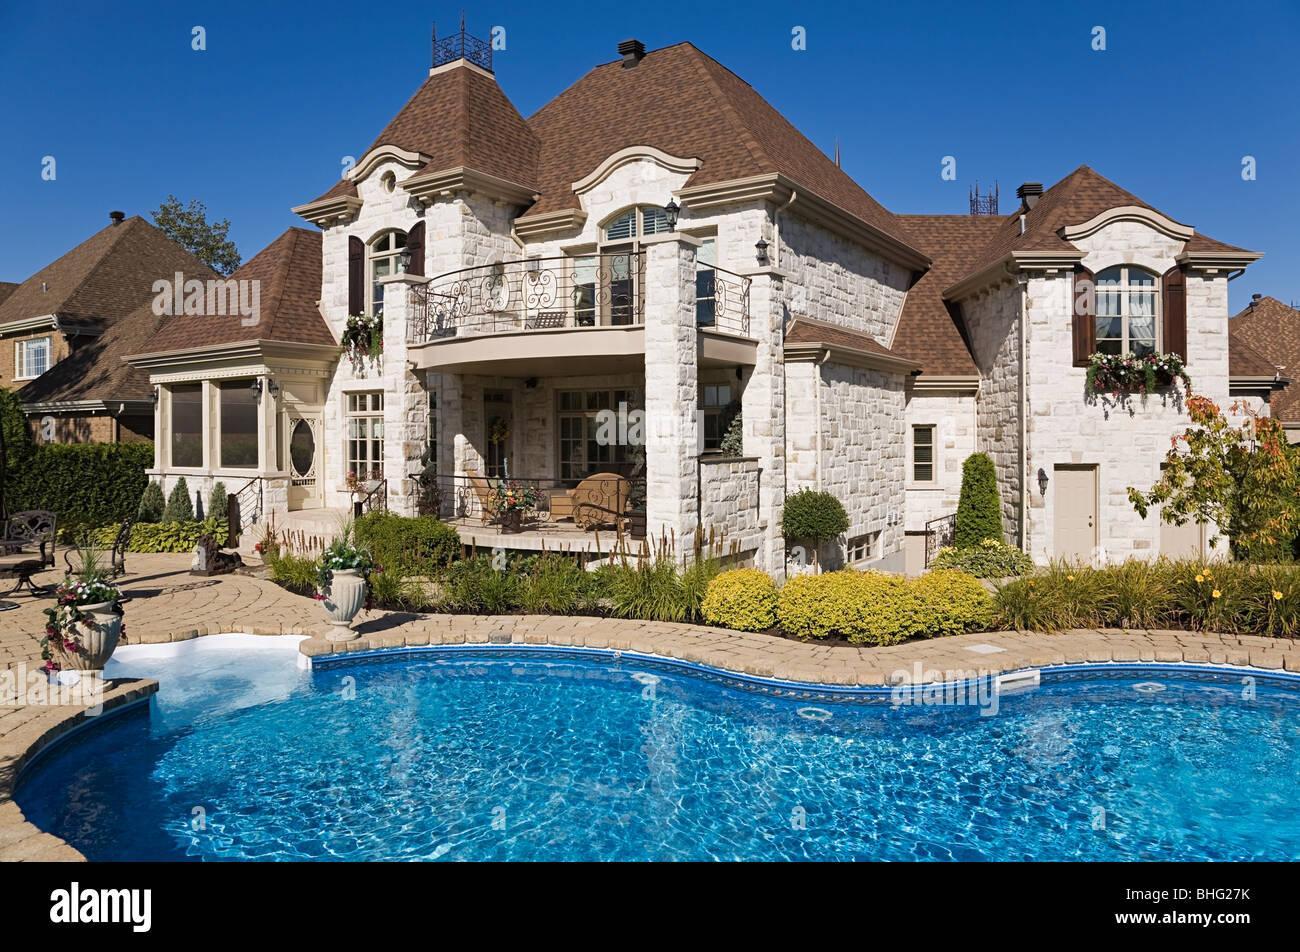 Grande maison avec piscine Photo Stock